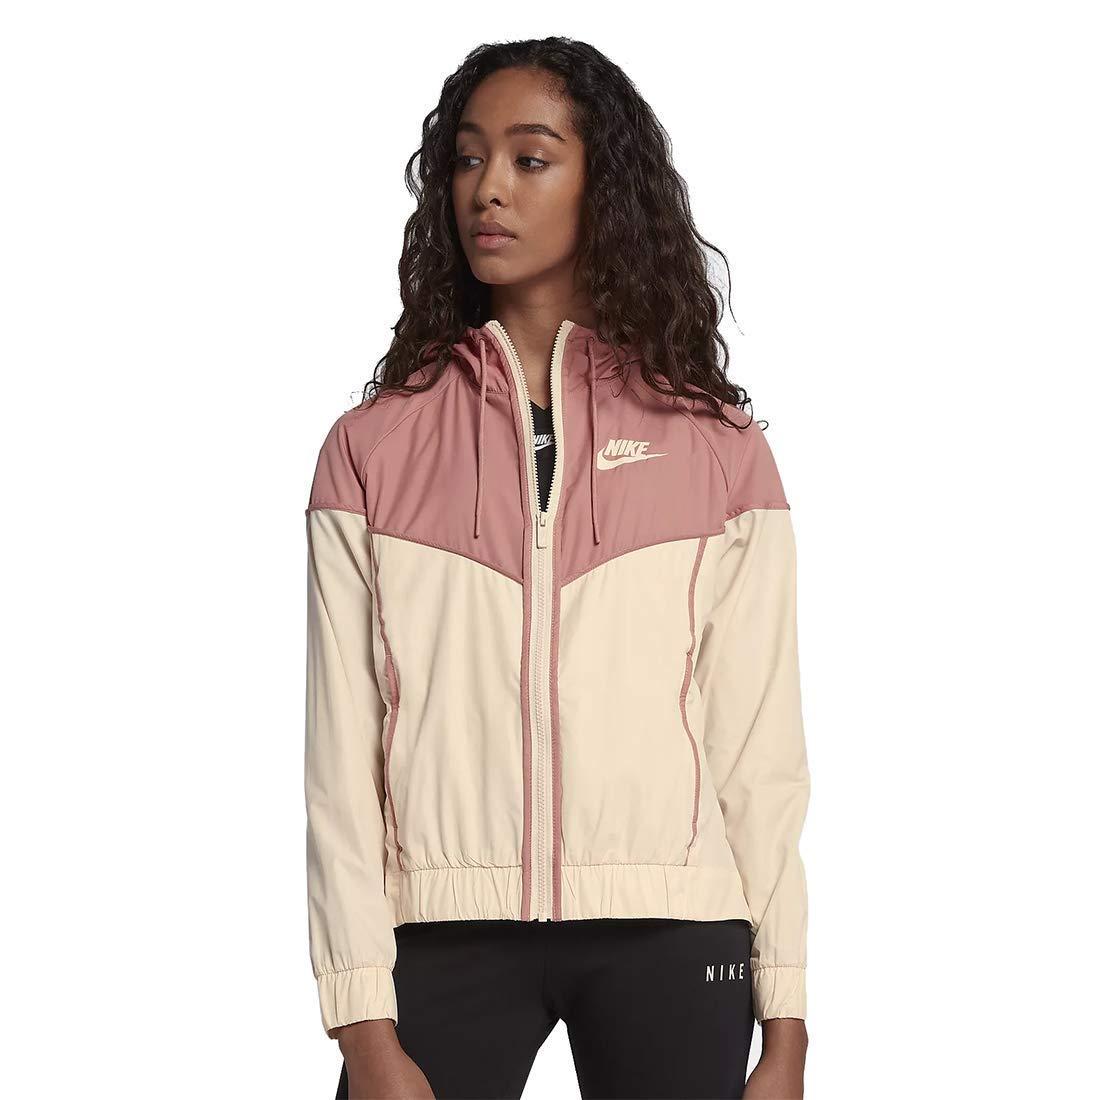 separation shoes bcf65 d1b14 Galleon - NIKE Sportswear Windrunner Women s Jacket (Guava Ice Rust Pink, L)